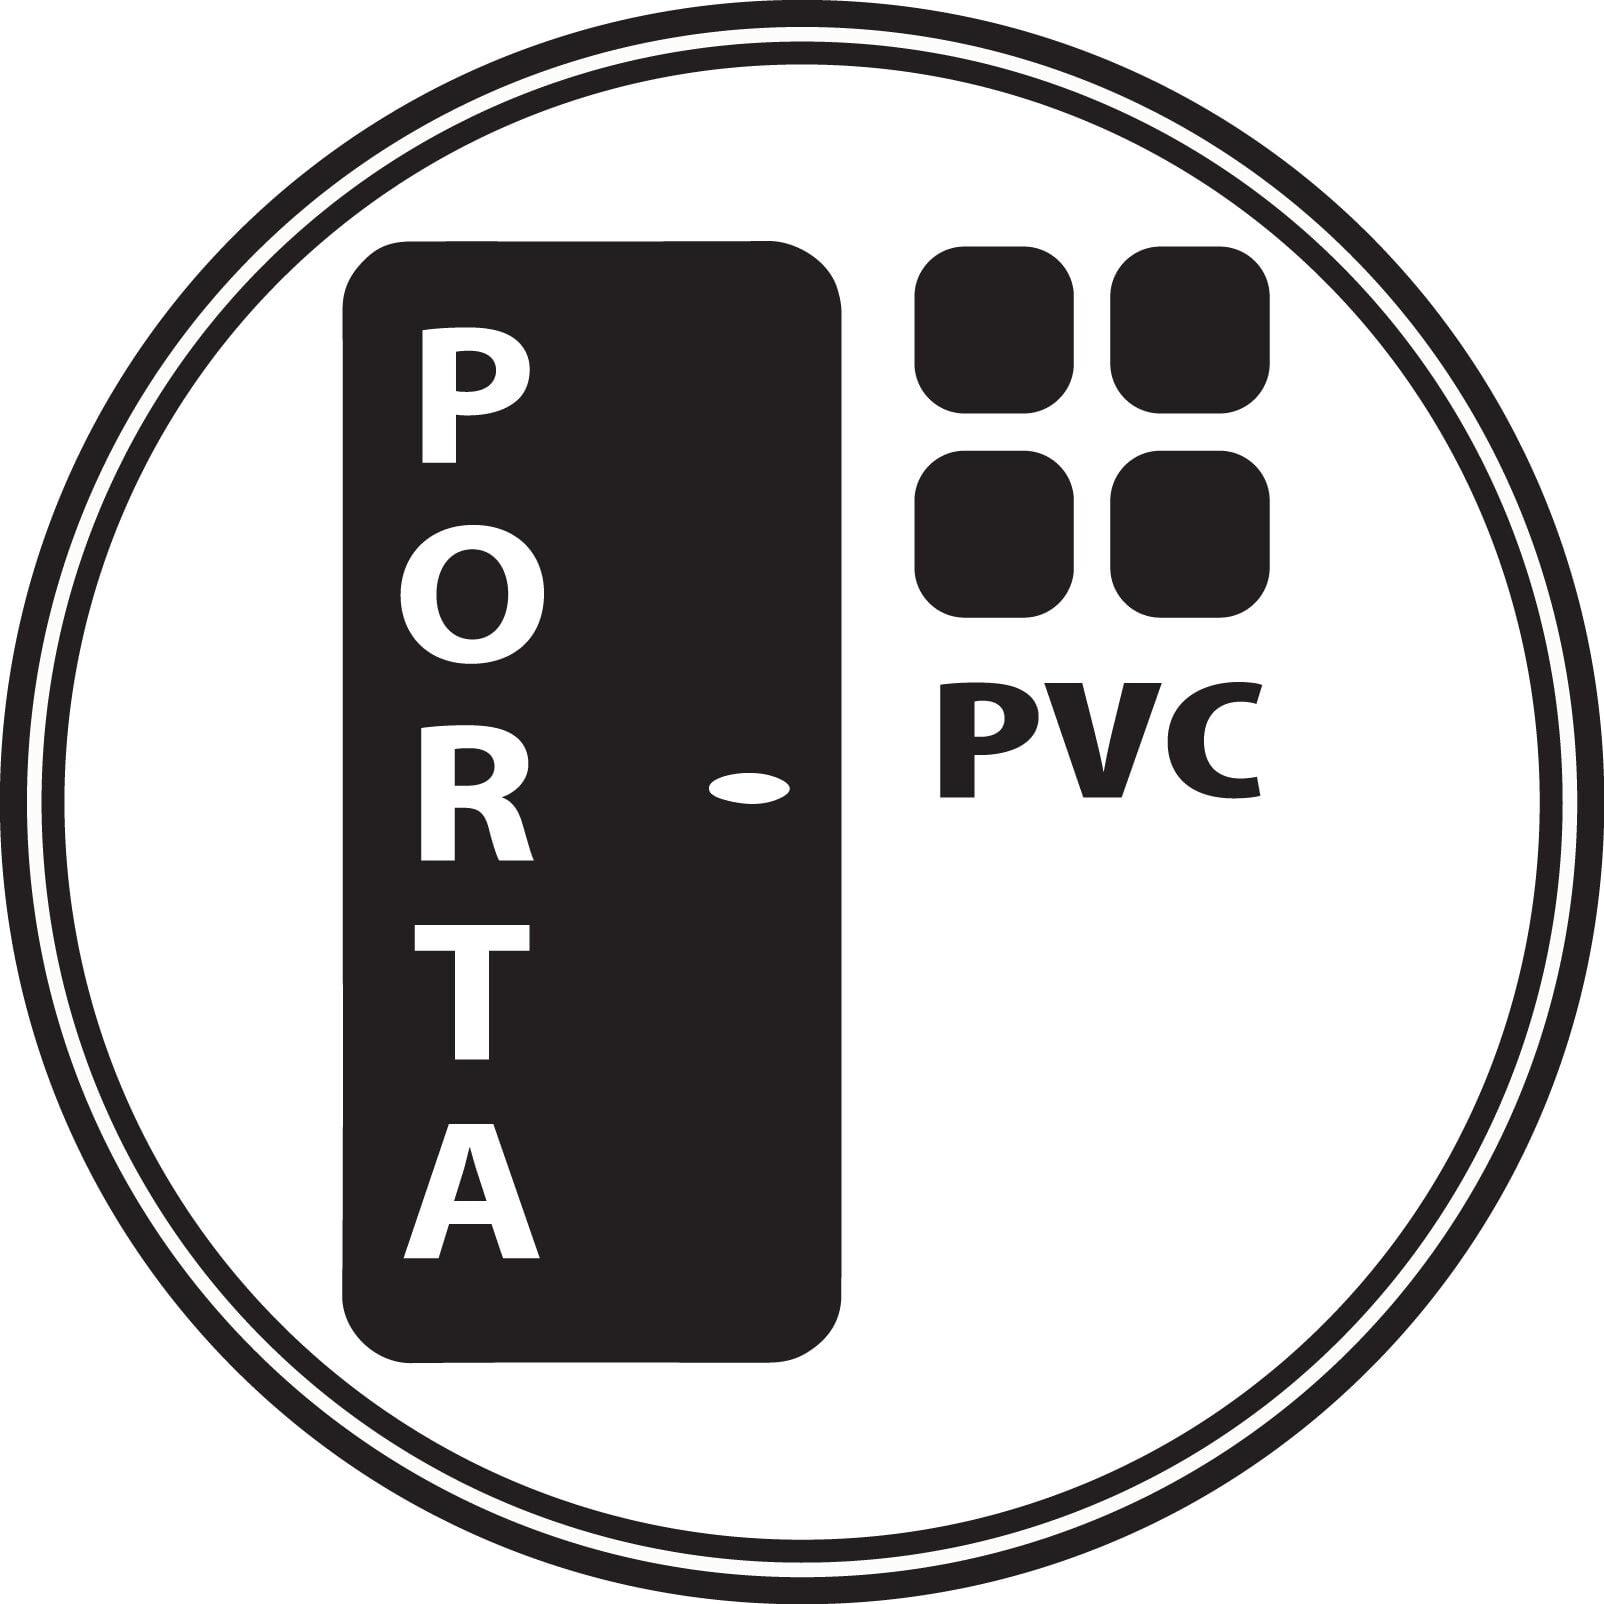 PORTA PVC D.O.O.